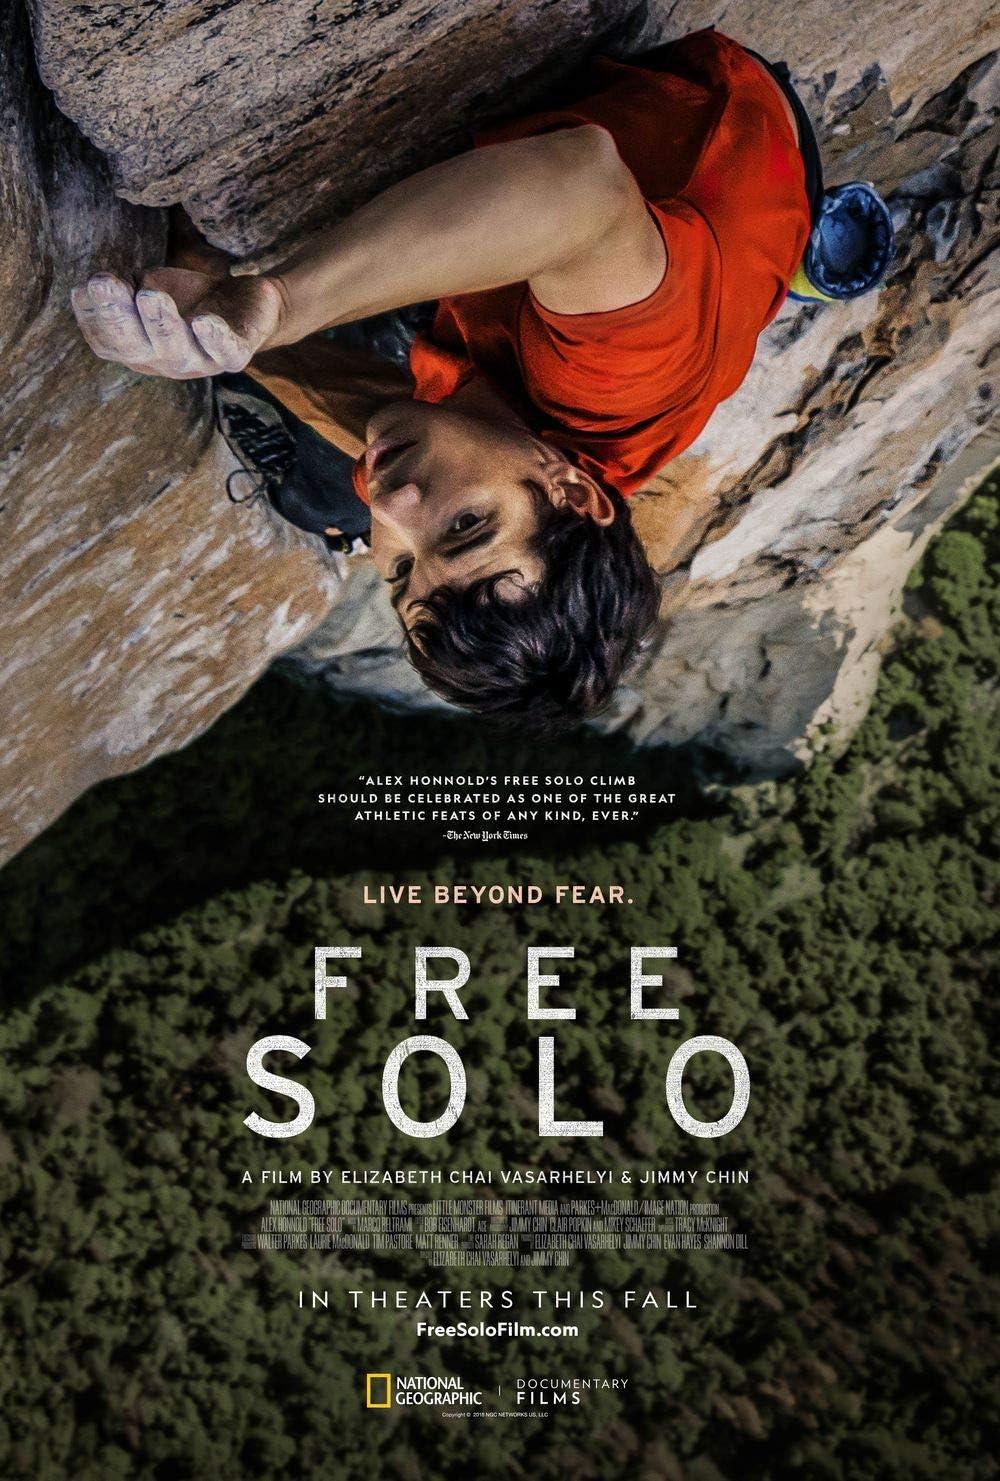 Poster Free Solo Movie 70 X 45 cm: Amazon.es: Hogar